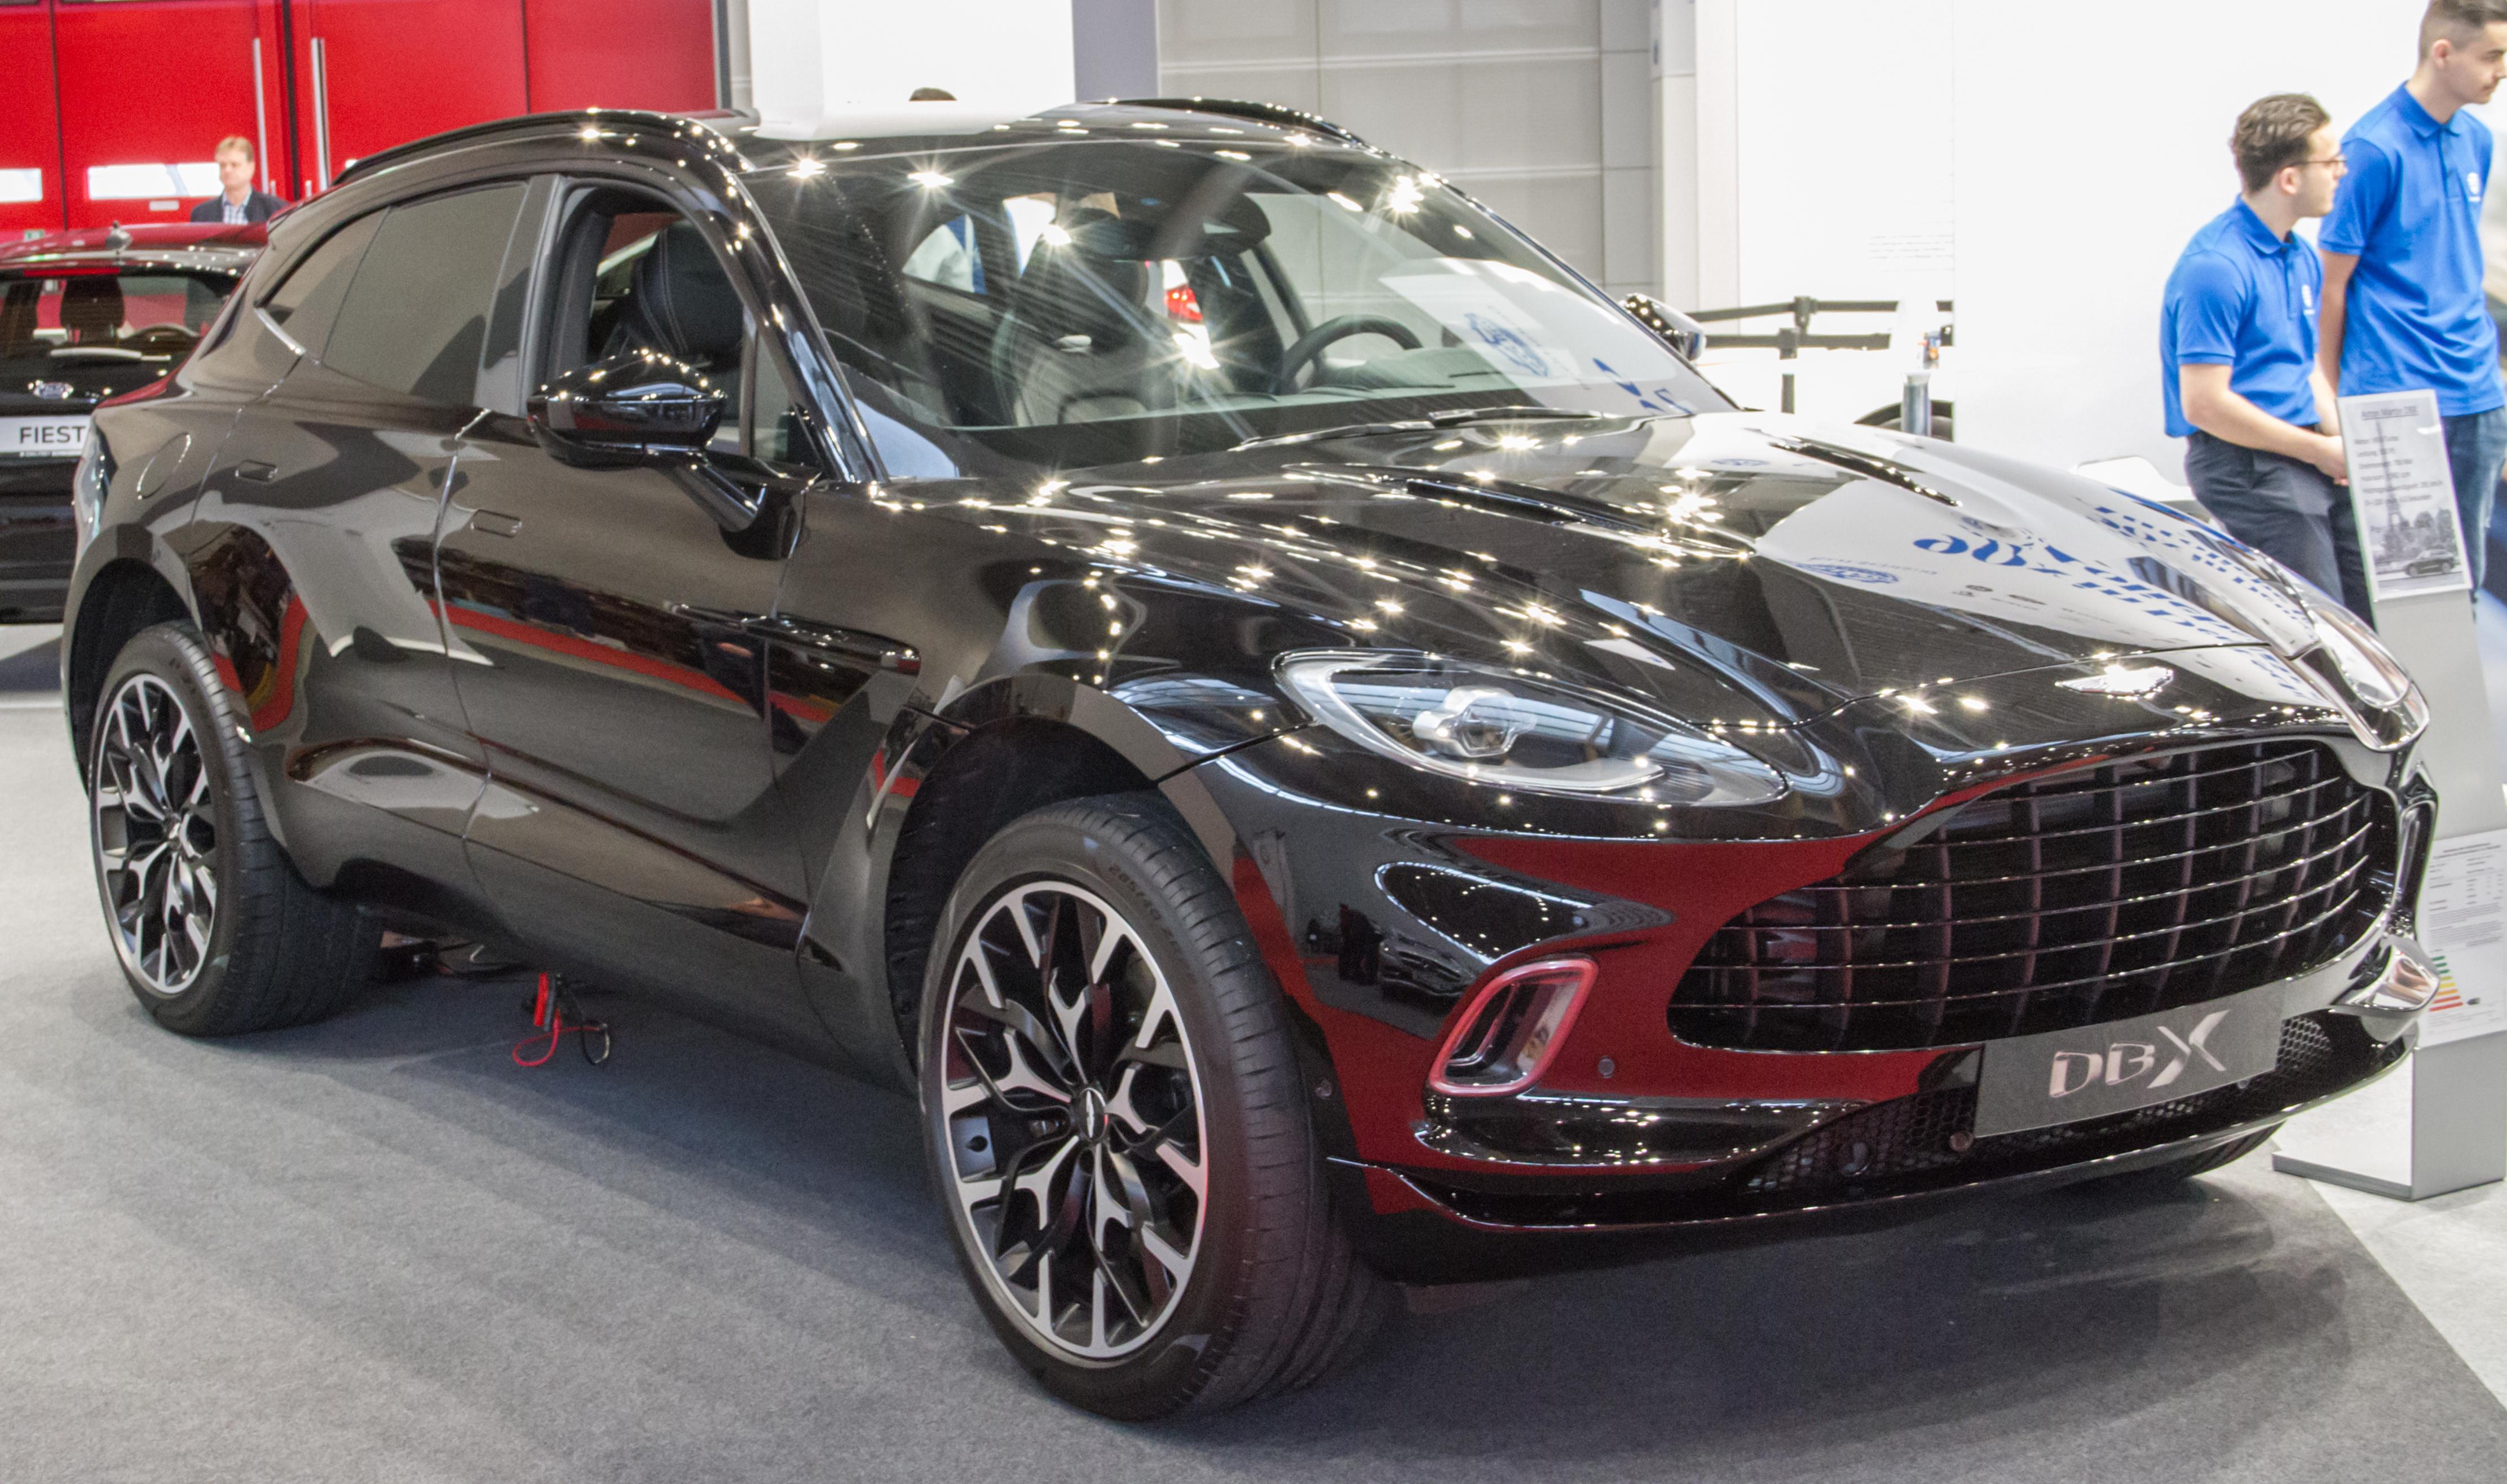 Aston Martin Dbx Wikipedia